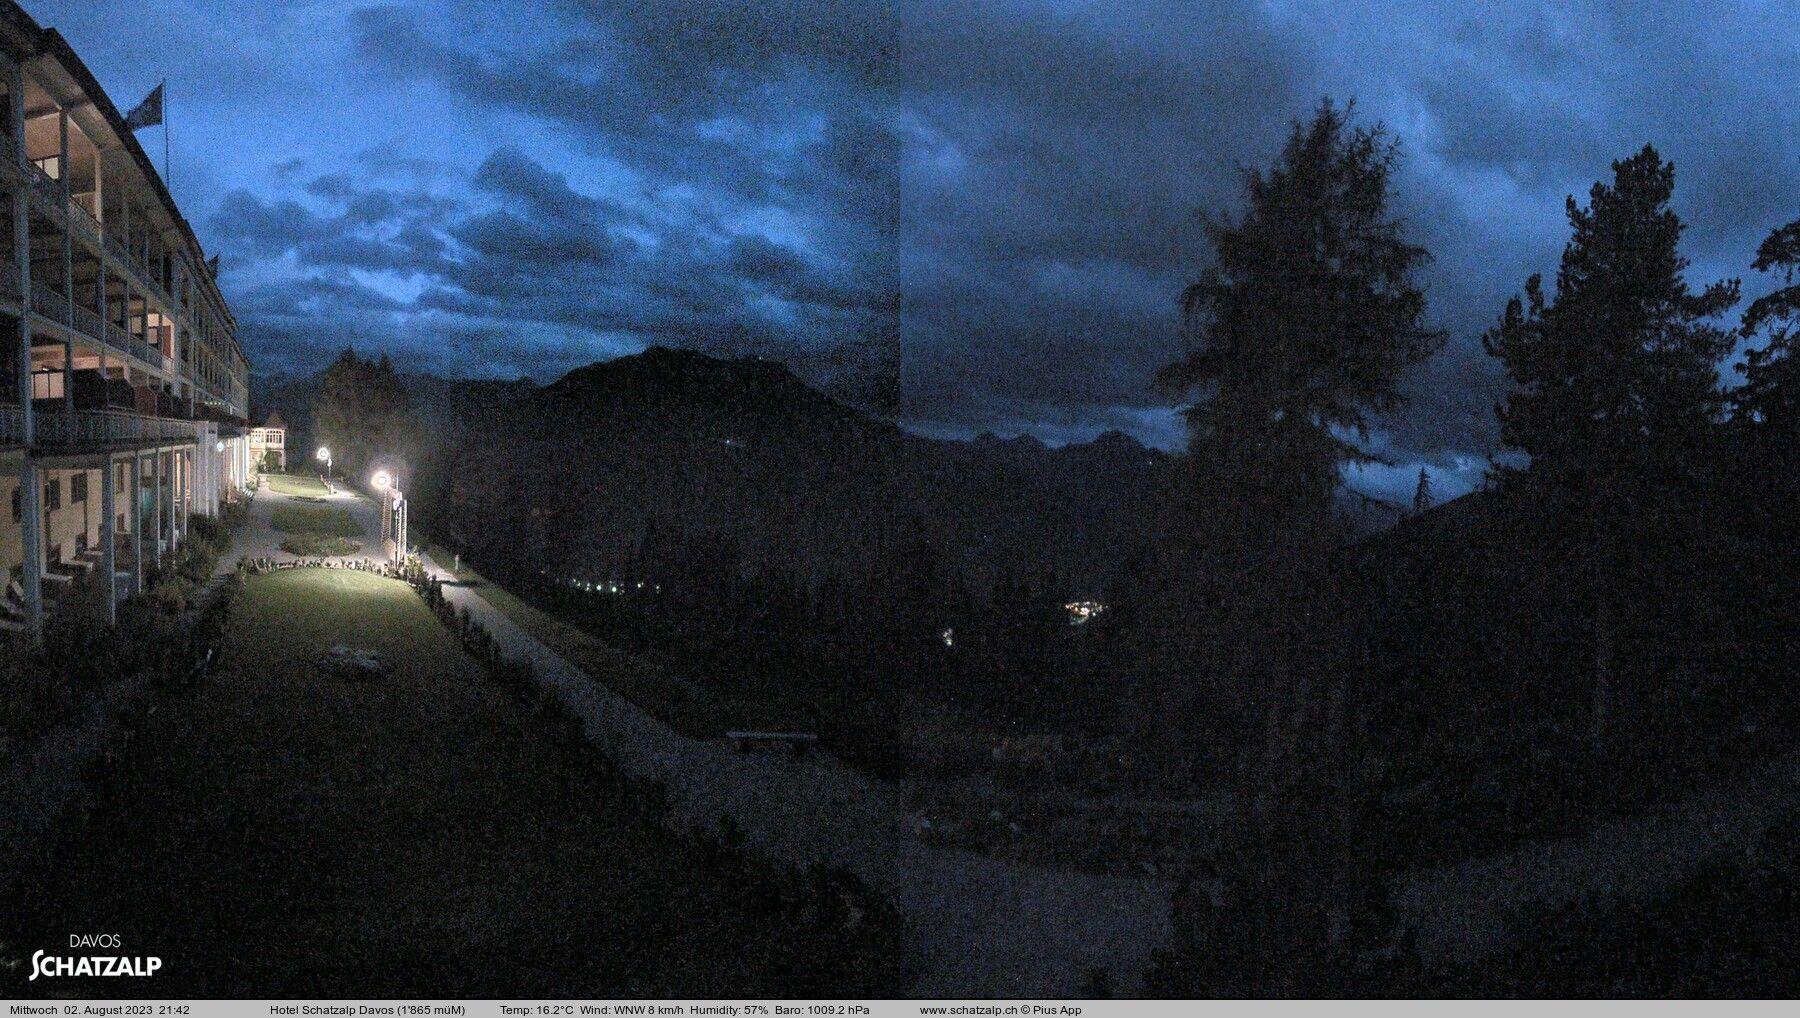 Davos: Schatzalp Panorama Hotel